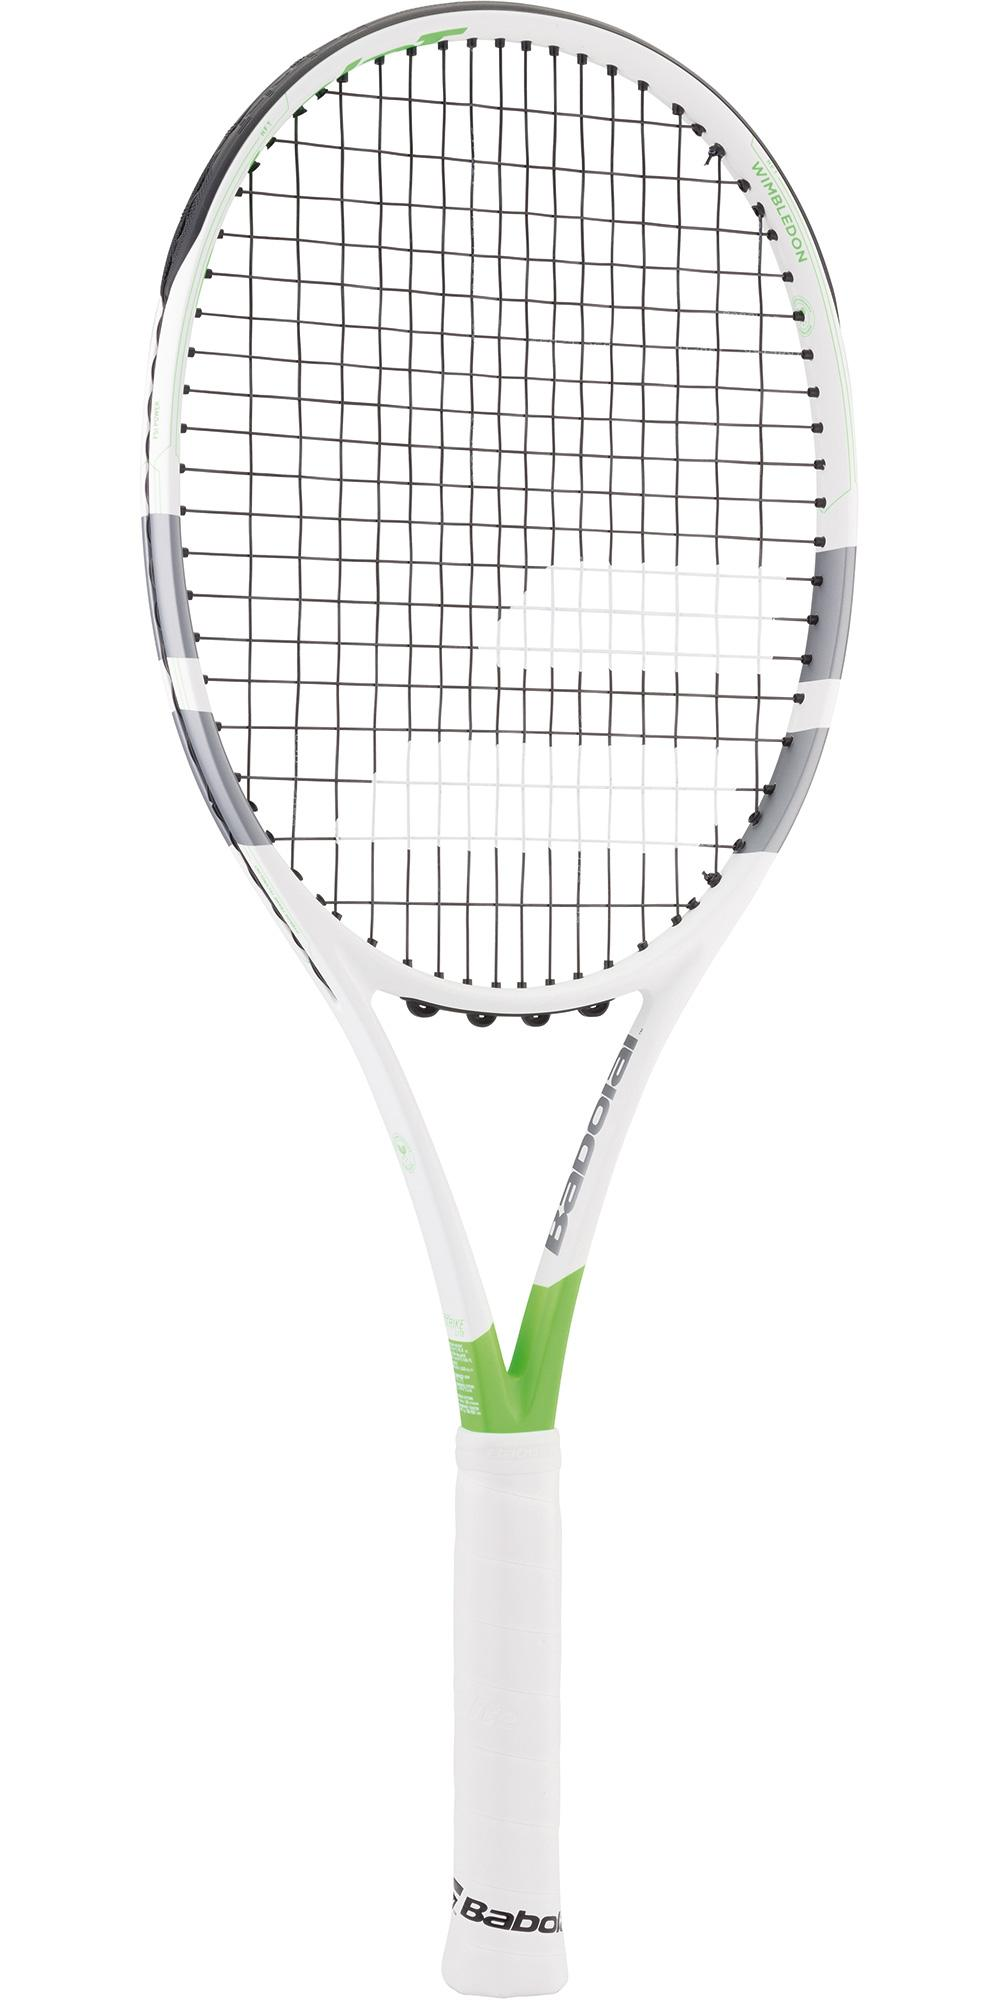 babolat pure strike lite wimbledon tennis racket. Black Bedroom Furniture Sets. Home Design Ideas